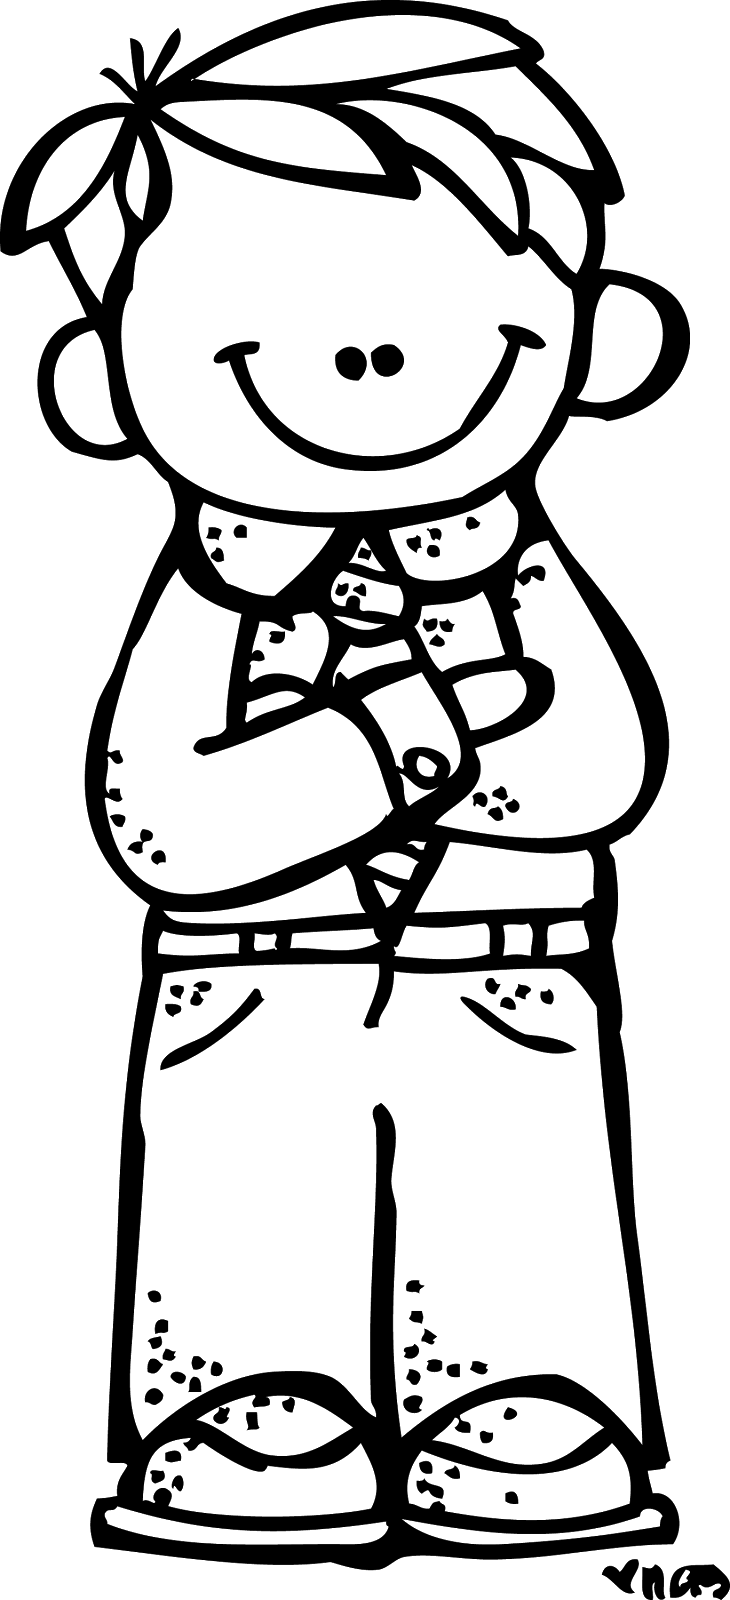 School boy clipart black and white graphic transparent download Reverent Boy - art by Melonheadz LDS illustrating | church ... graphic transparent download